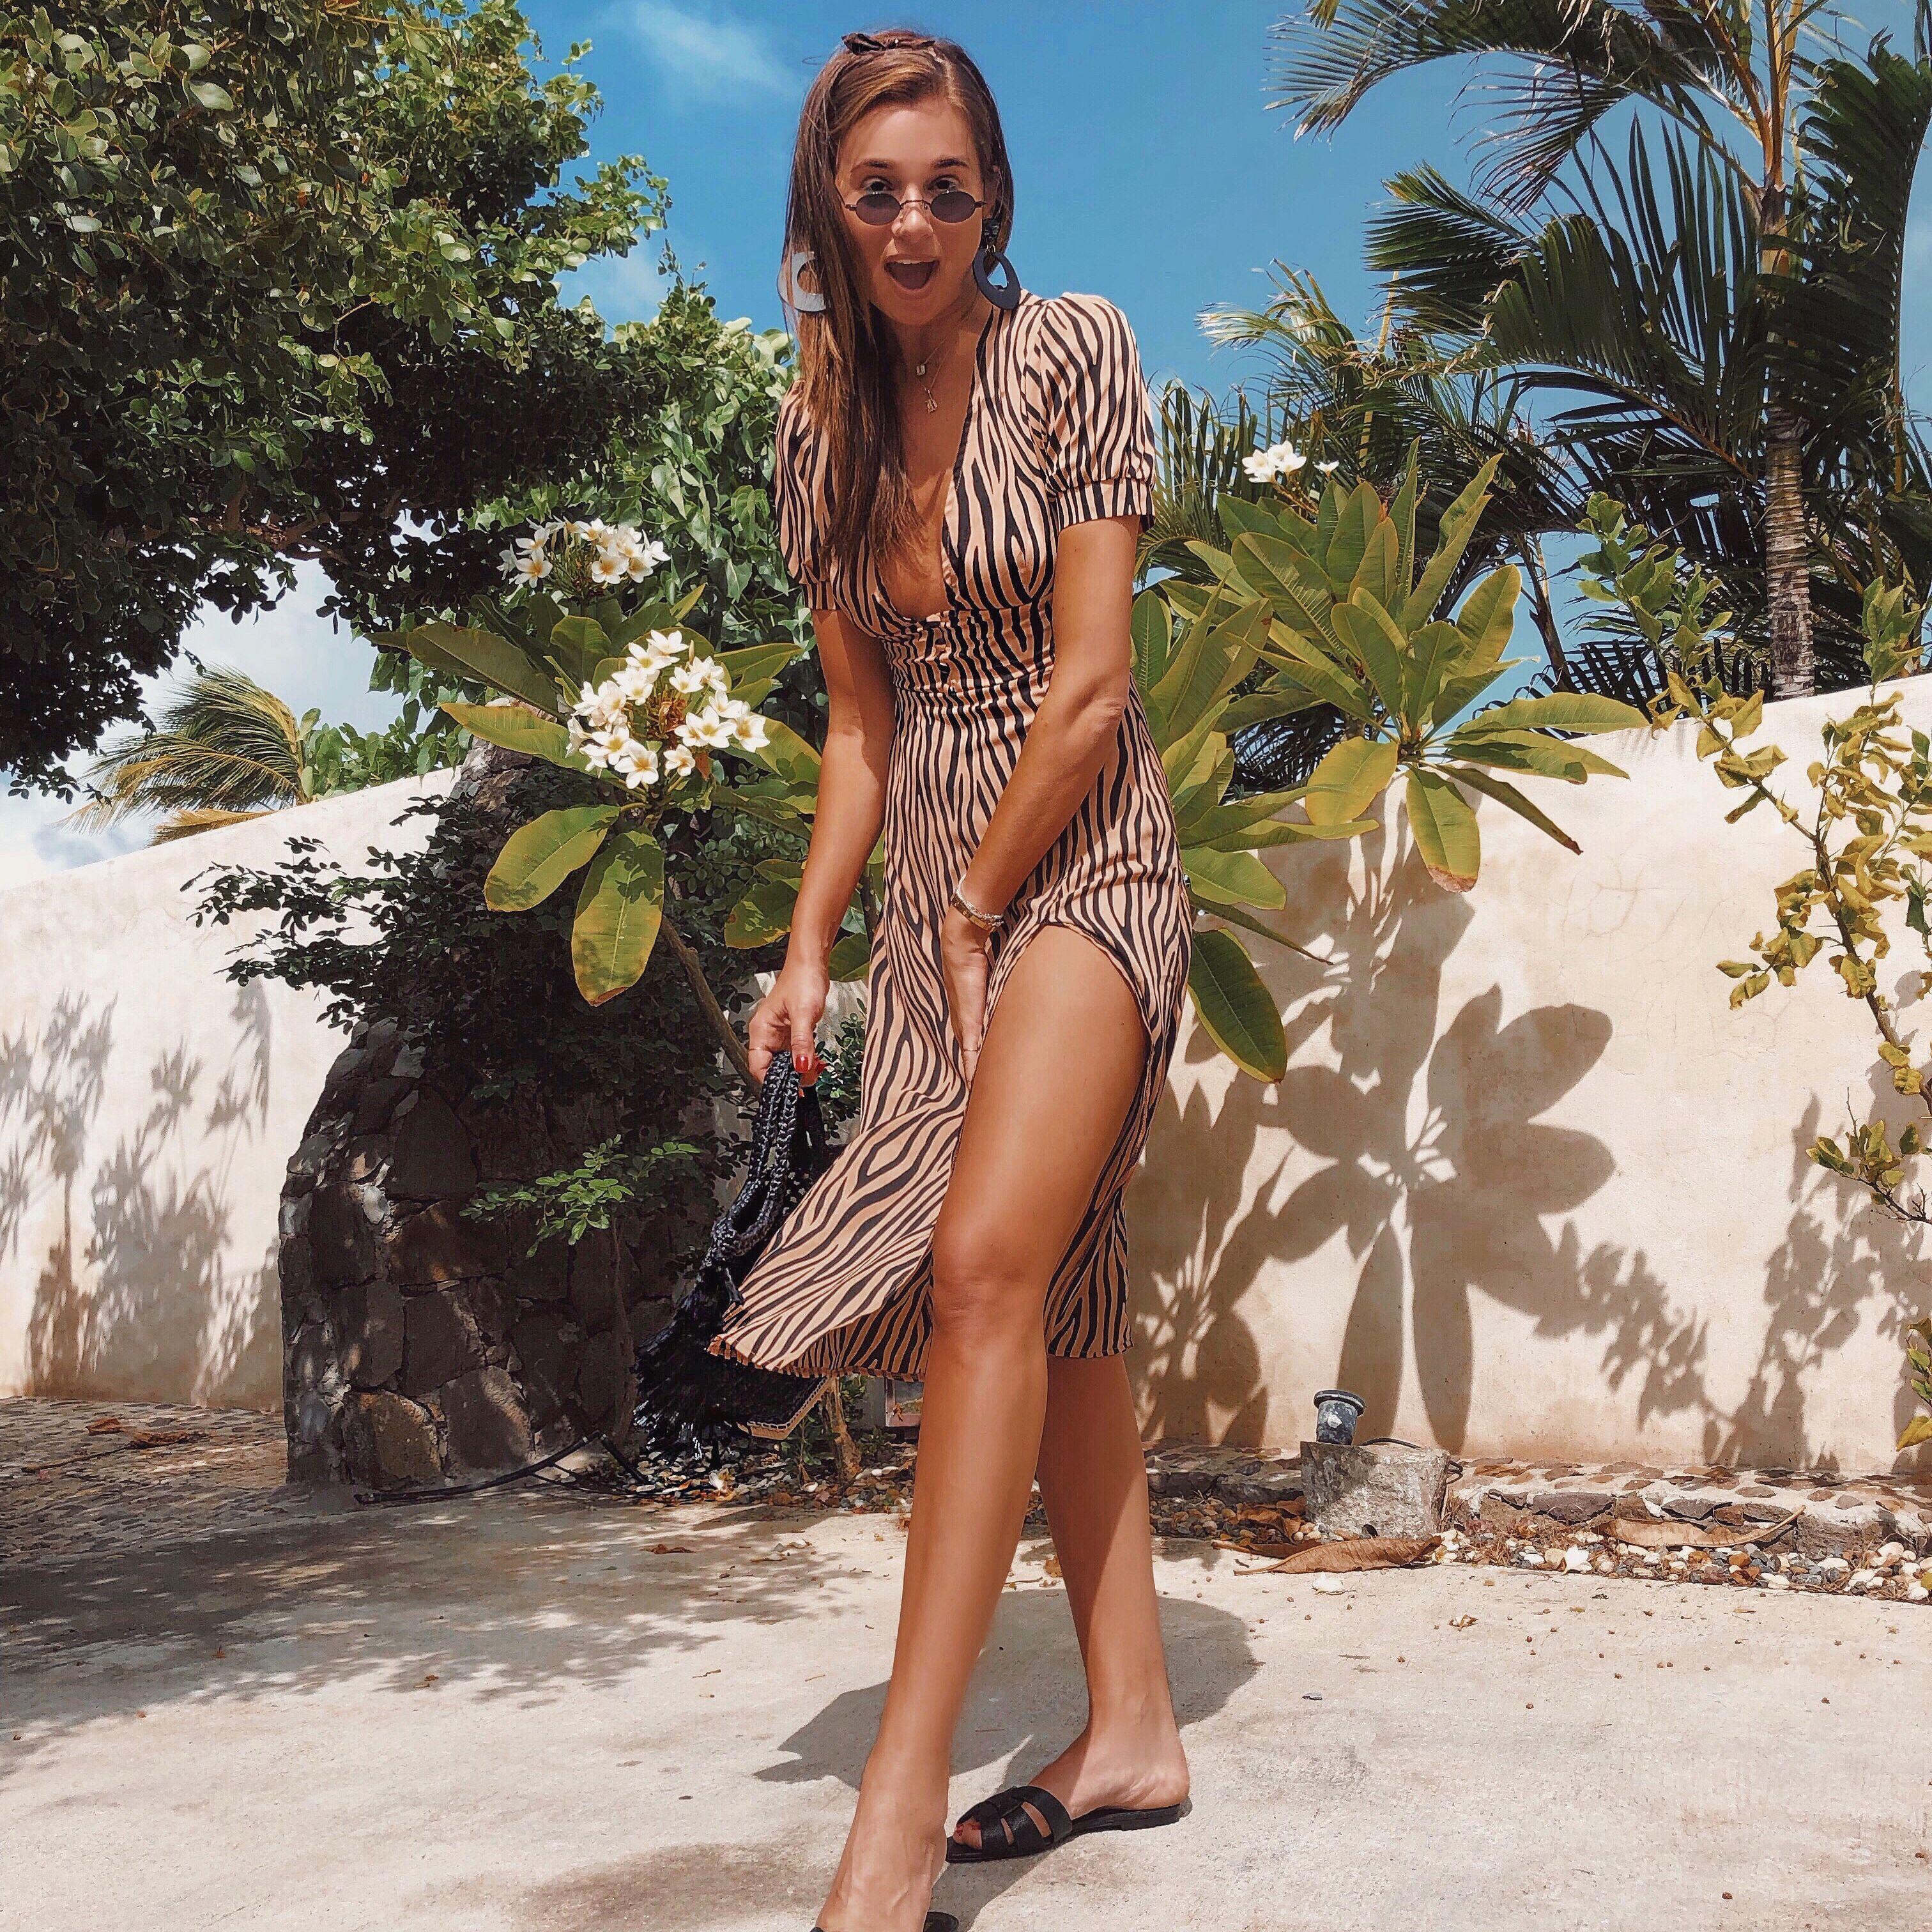 Woman in striped summer dress